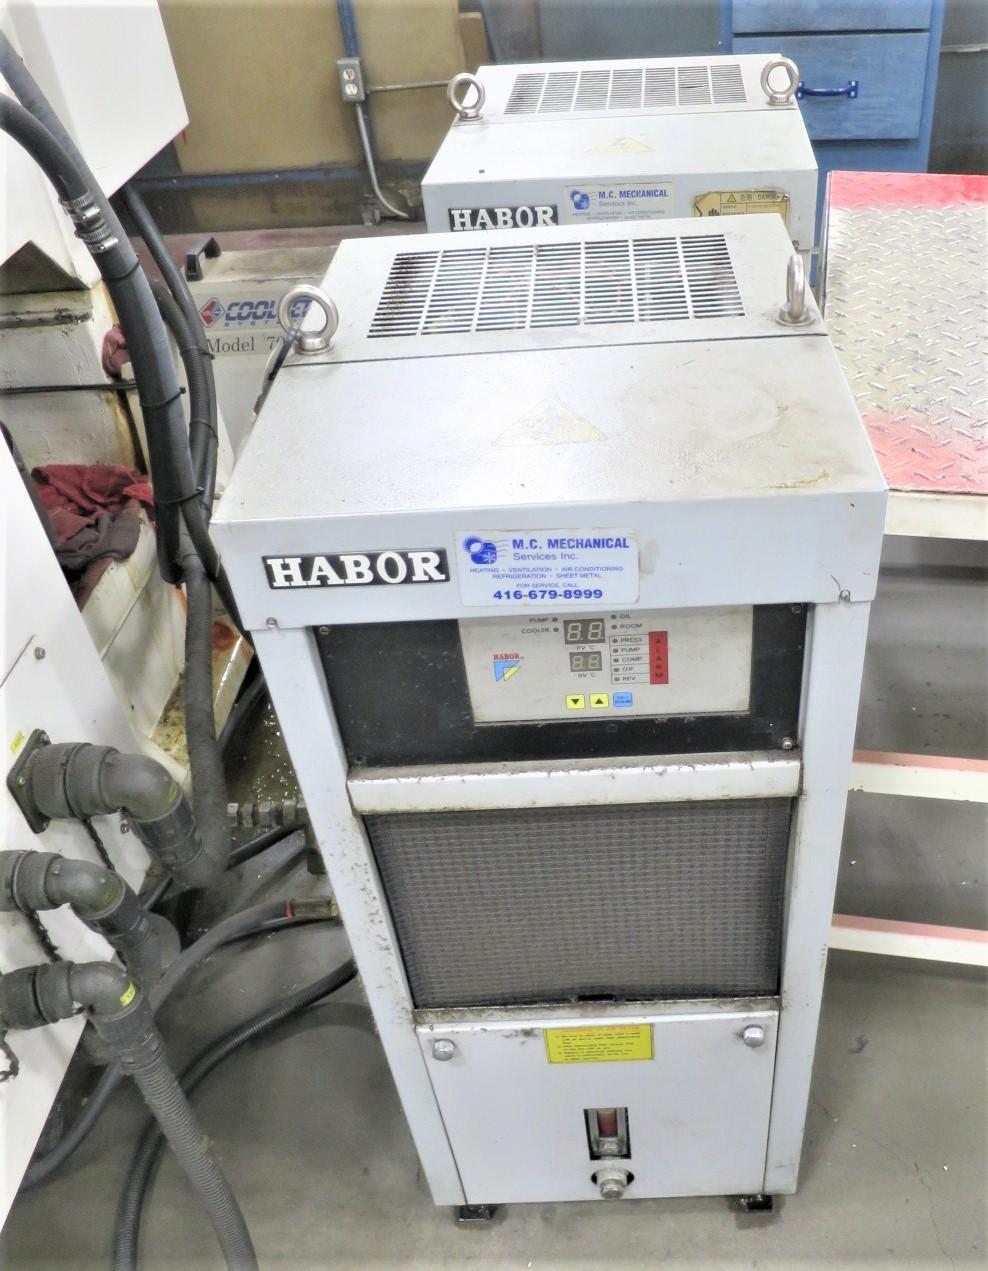 Lot 49 - Daewoo DMV-650 3-Axis 50 Taper CNC Vertical Machining Center, S/N AV6S0007, New 1997